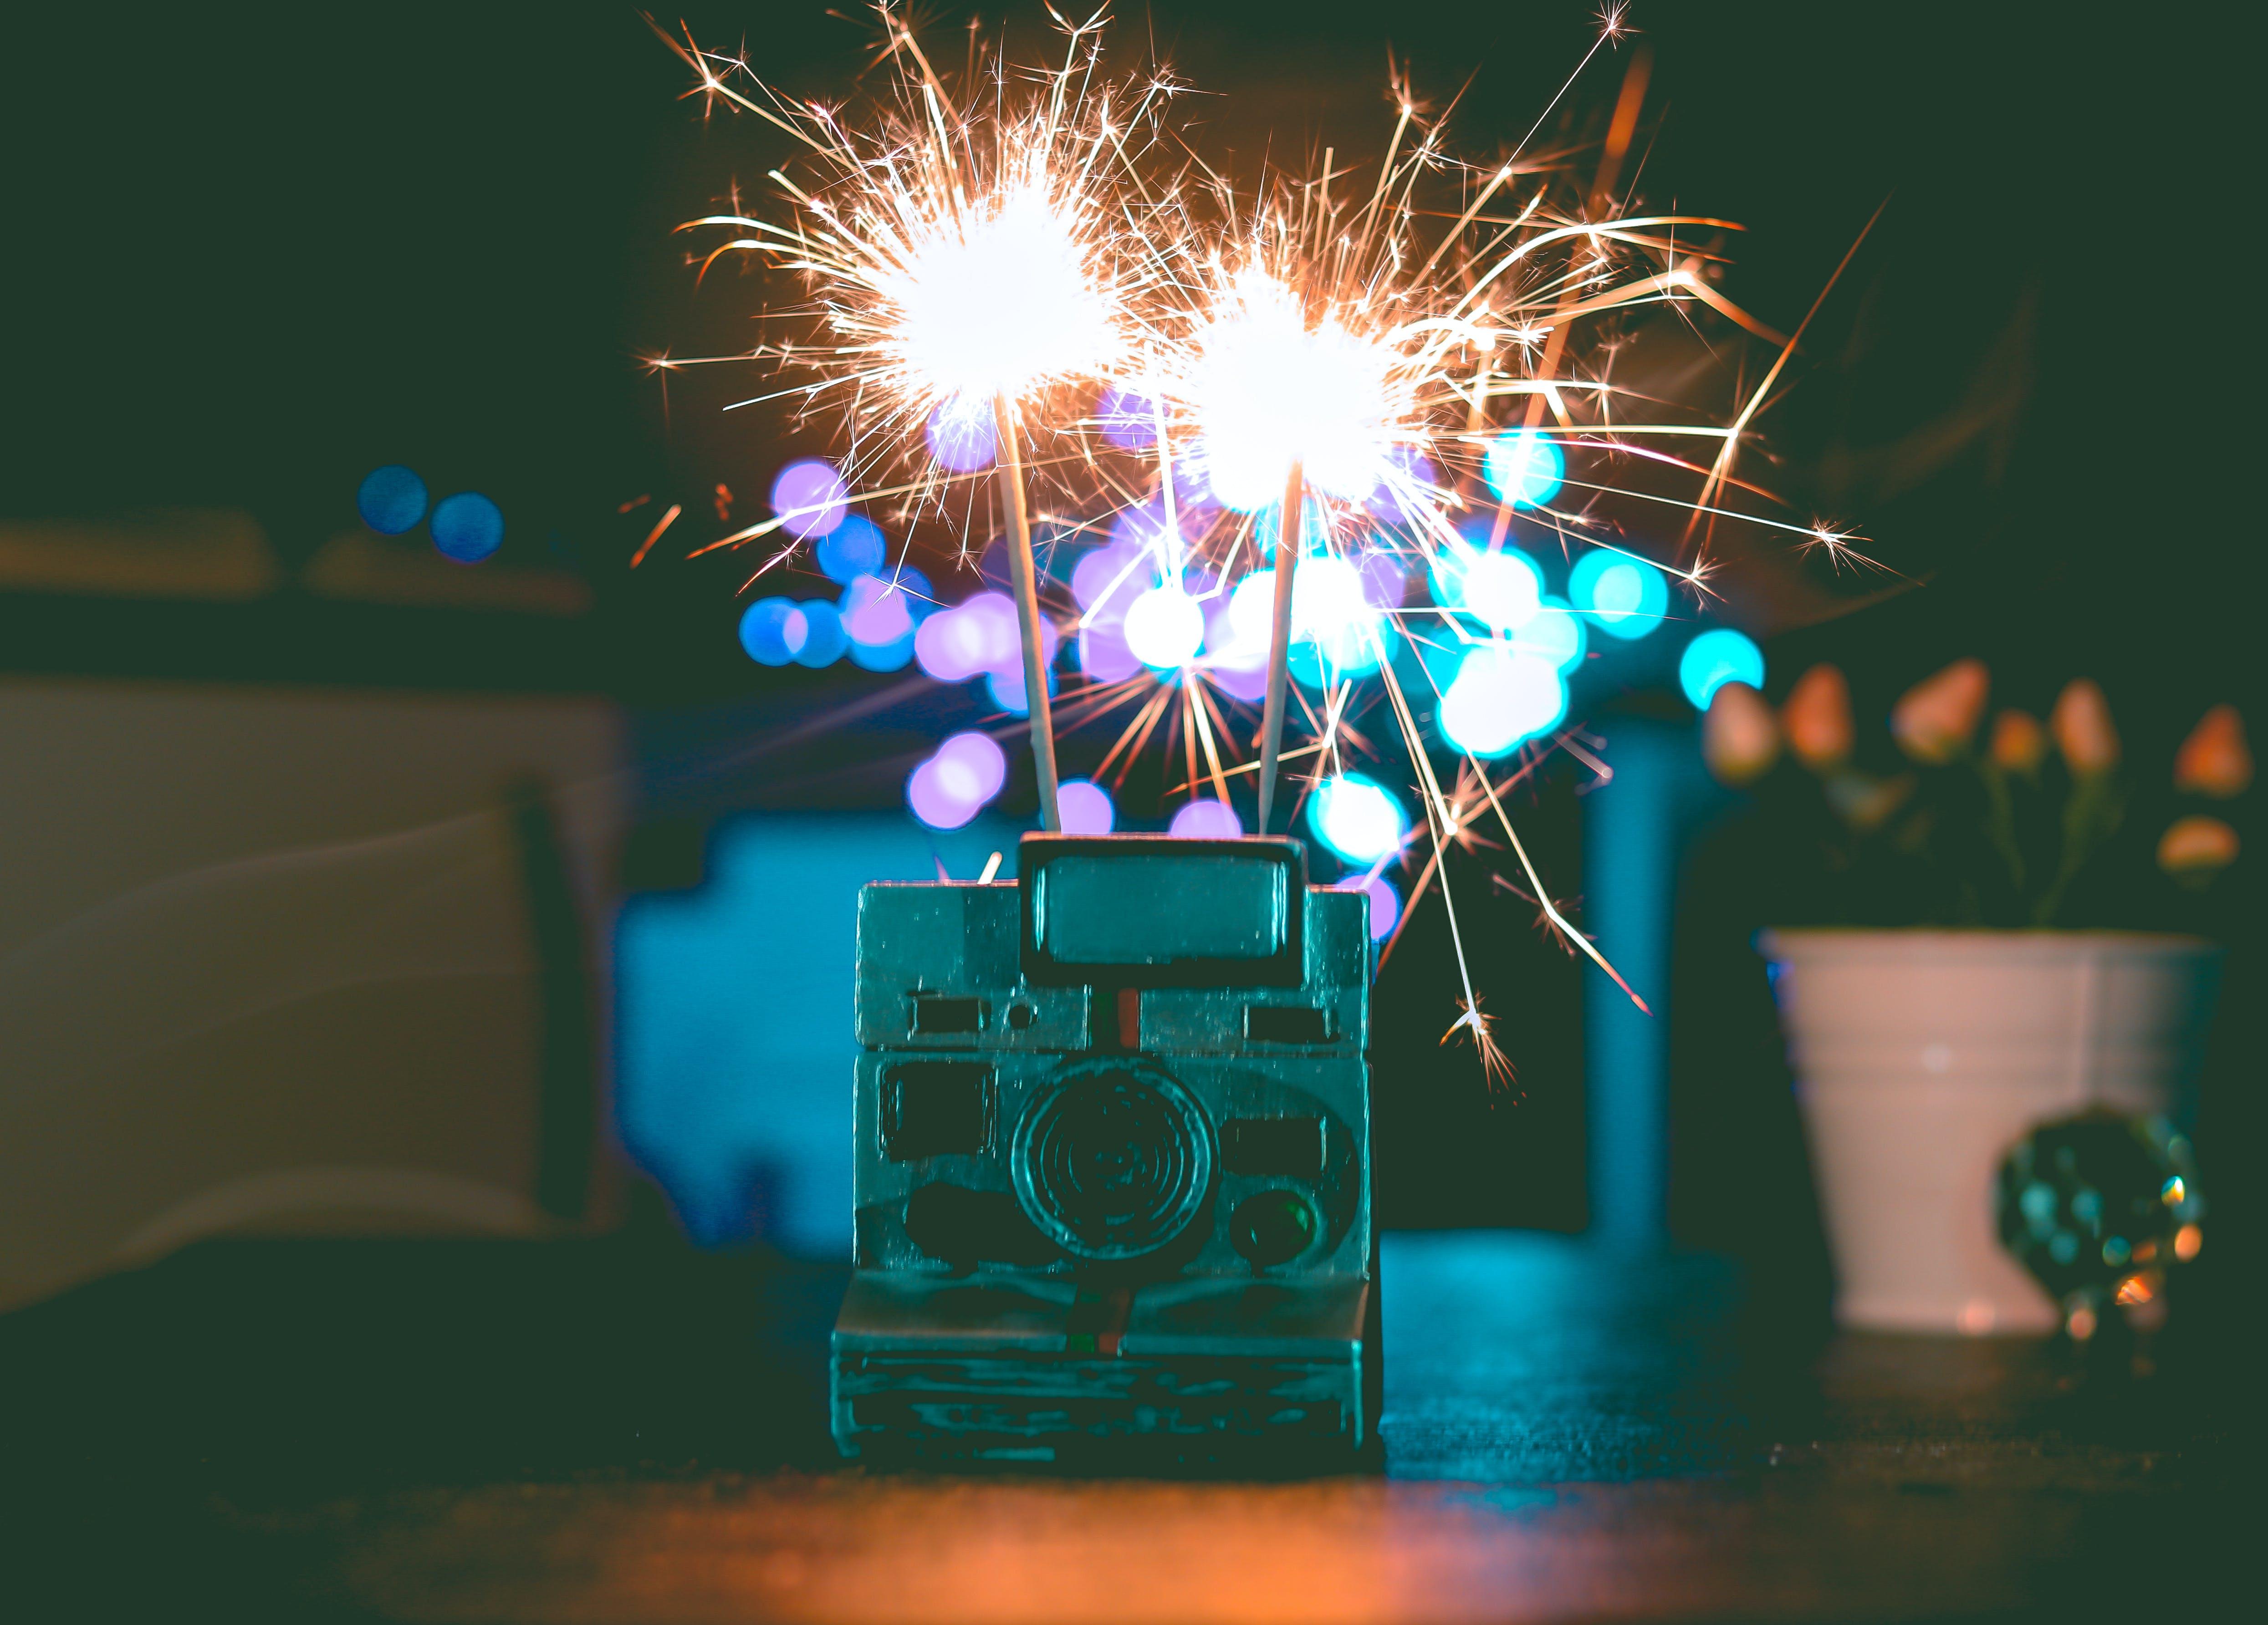 Polaroid Camera And Fireworks